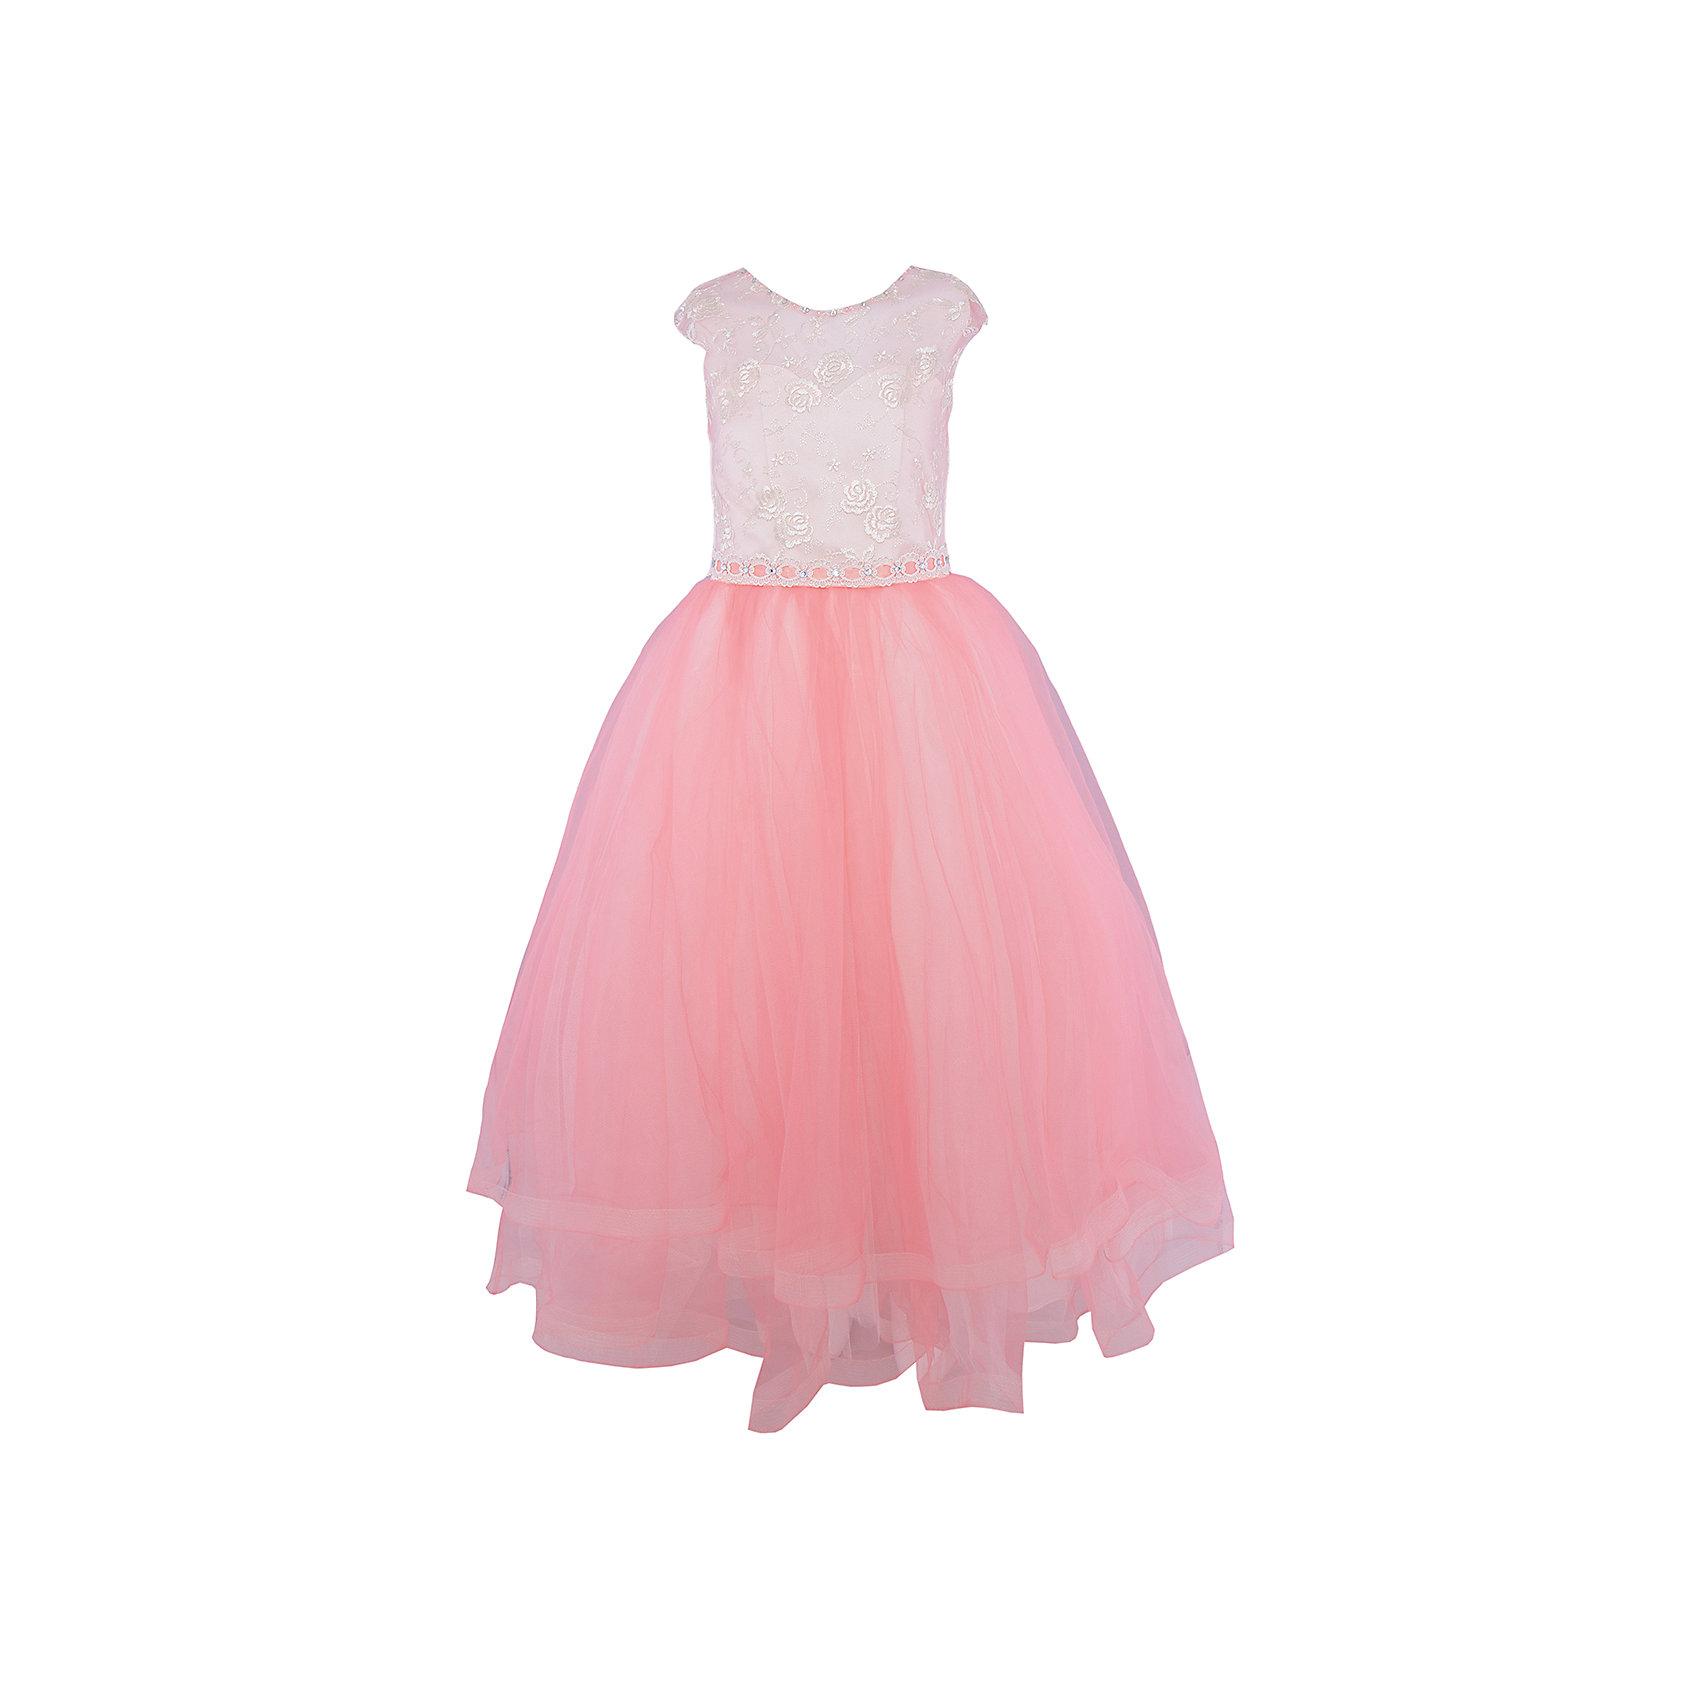 Престиж Платье нарядное Престиж sis katalog